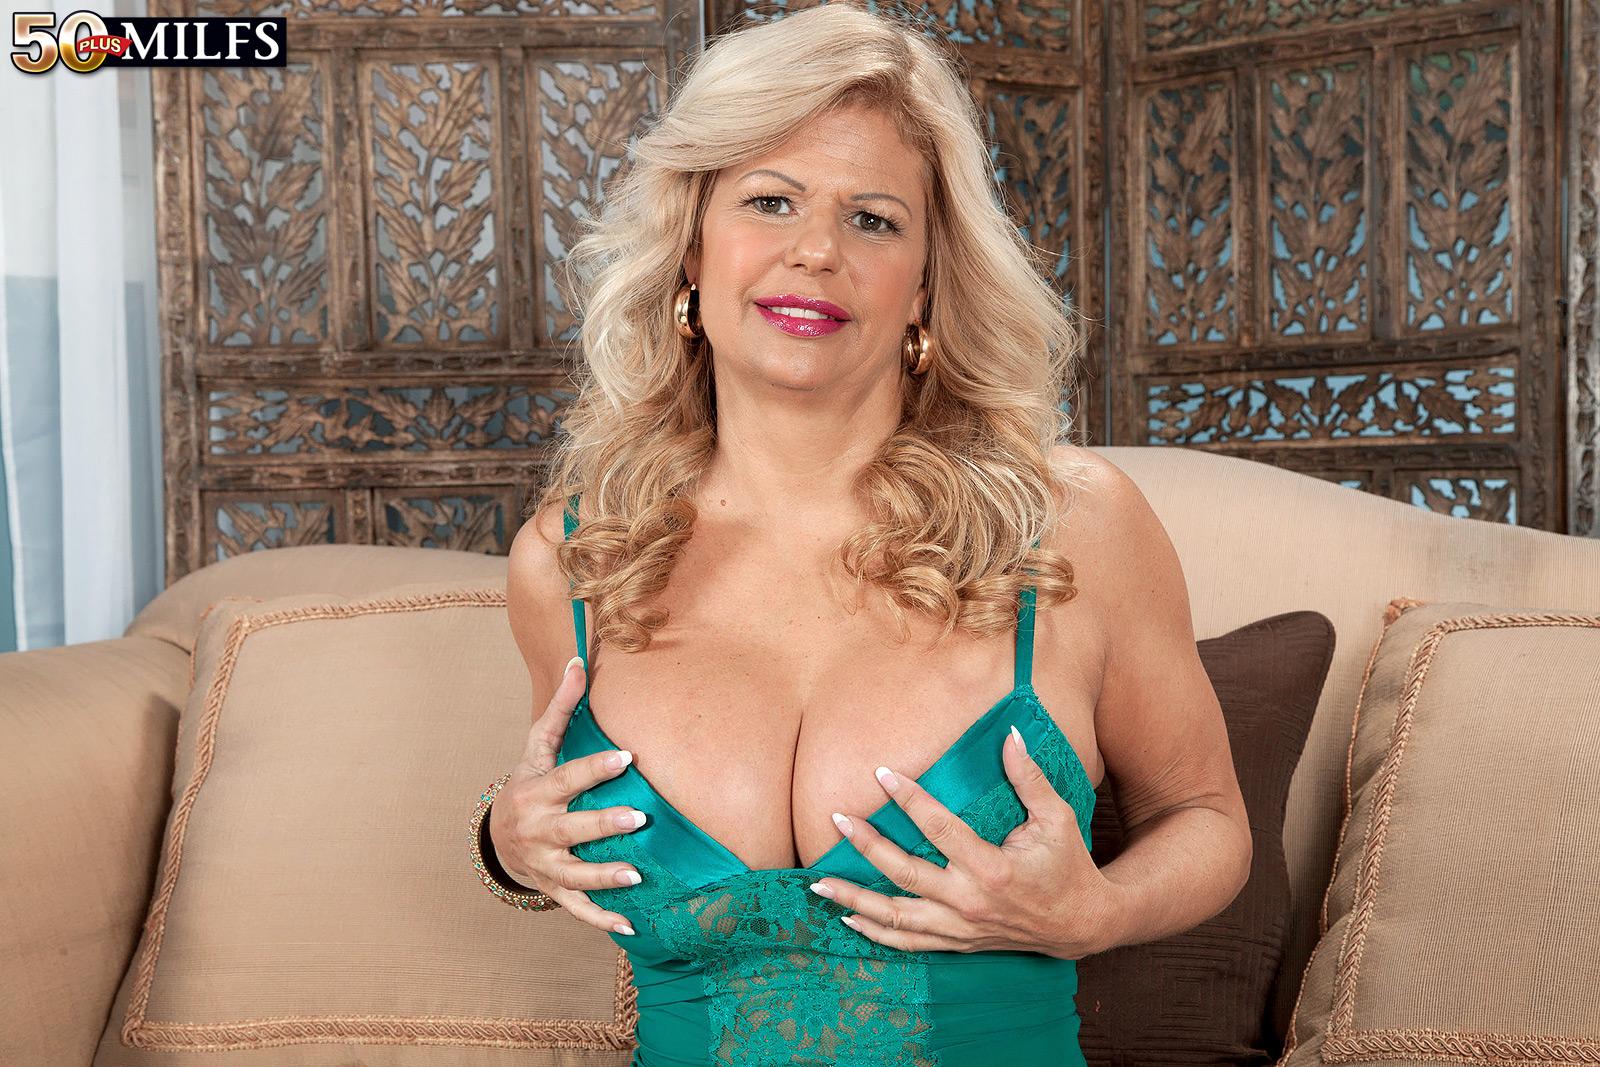 50 Plus Cougar Women Porn - Mature milf 50plus xxx - Busty mature gets fucked jpg 1600x1067